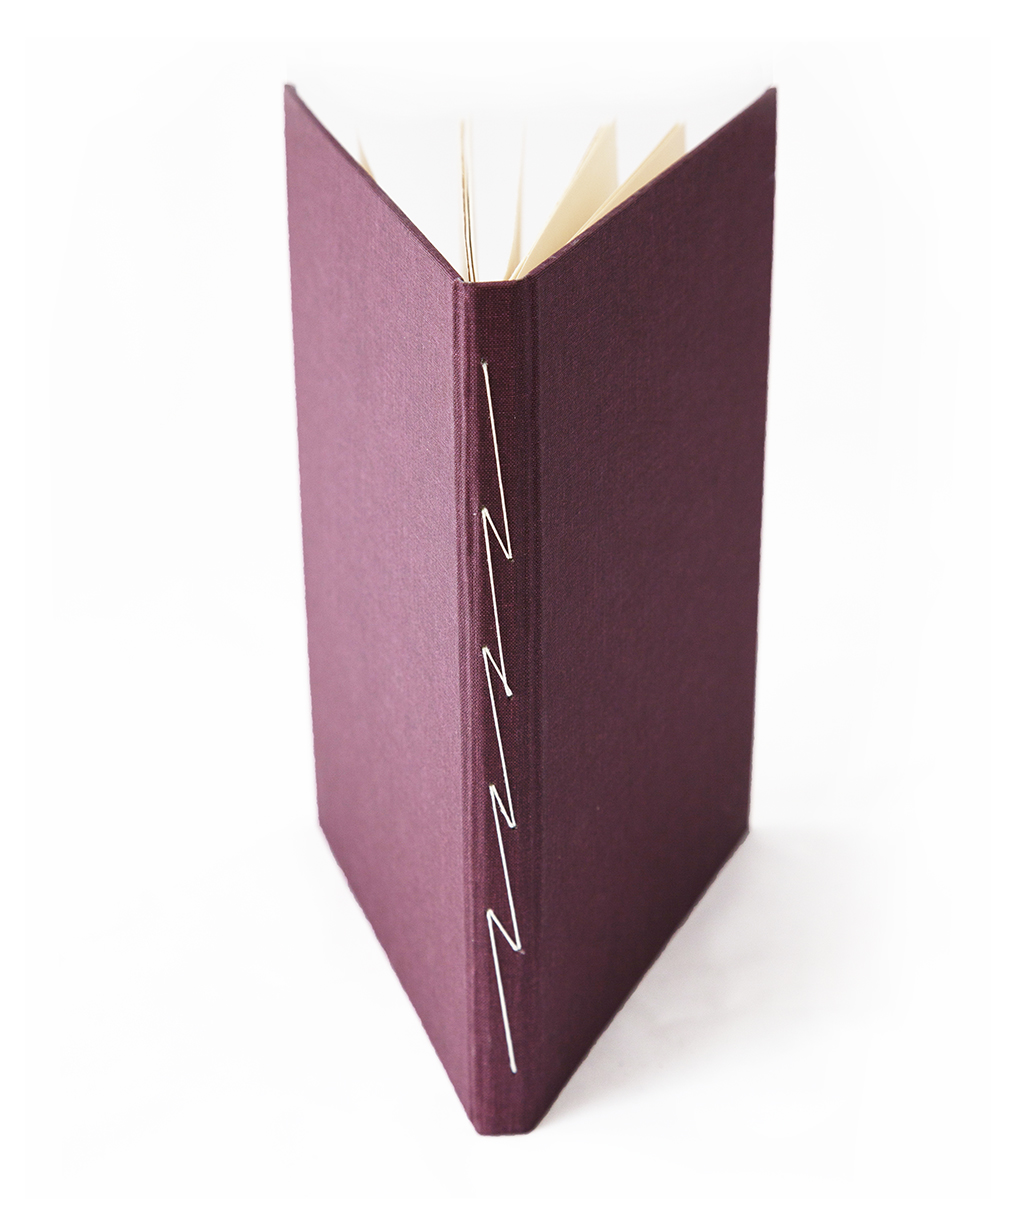 Lightning Stitch Book Binding